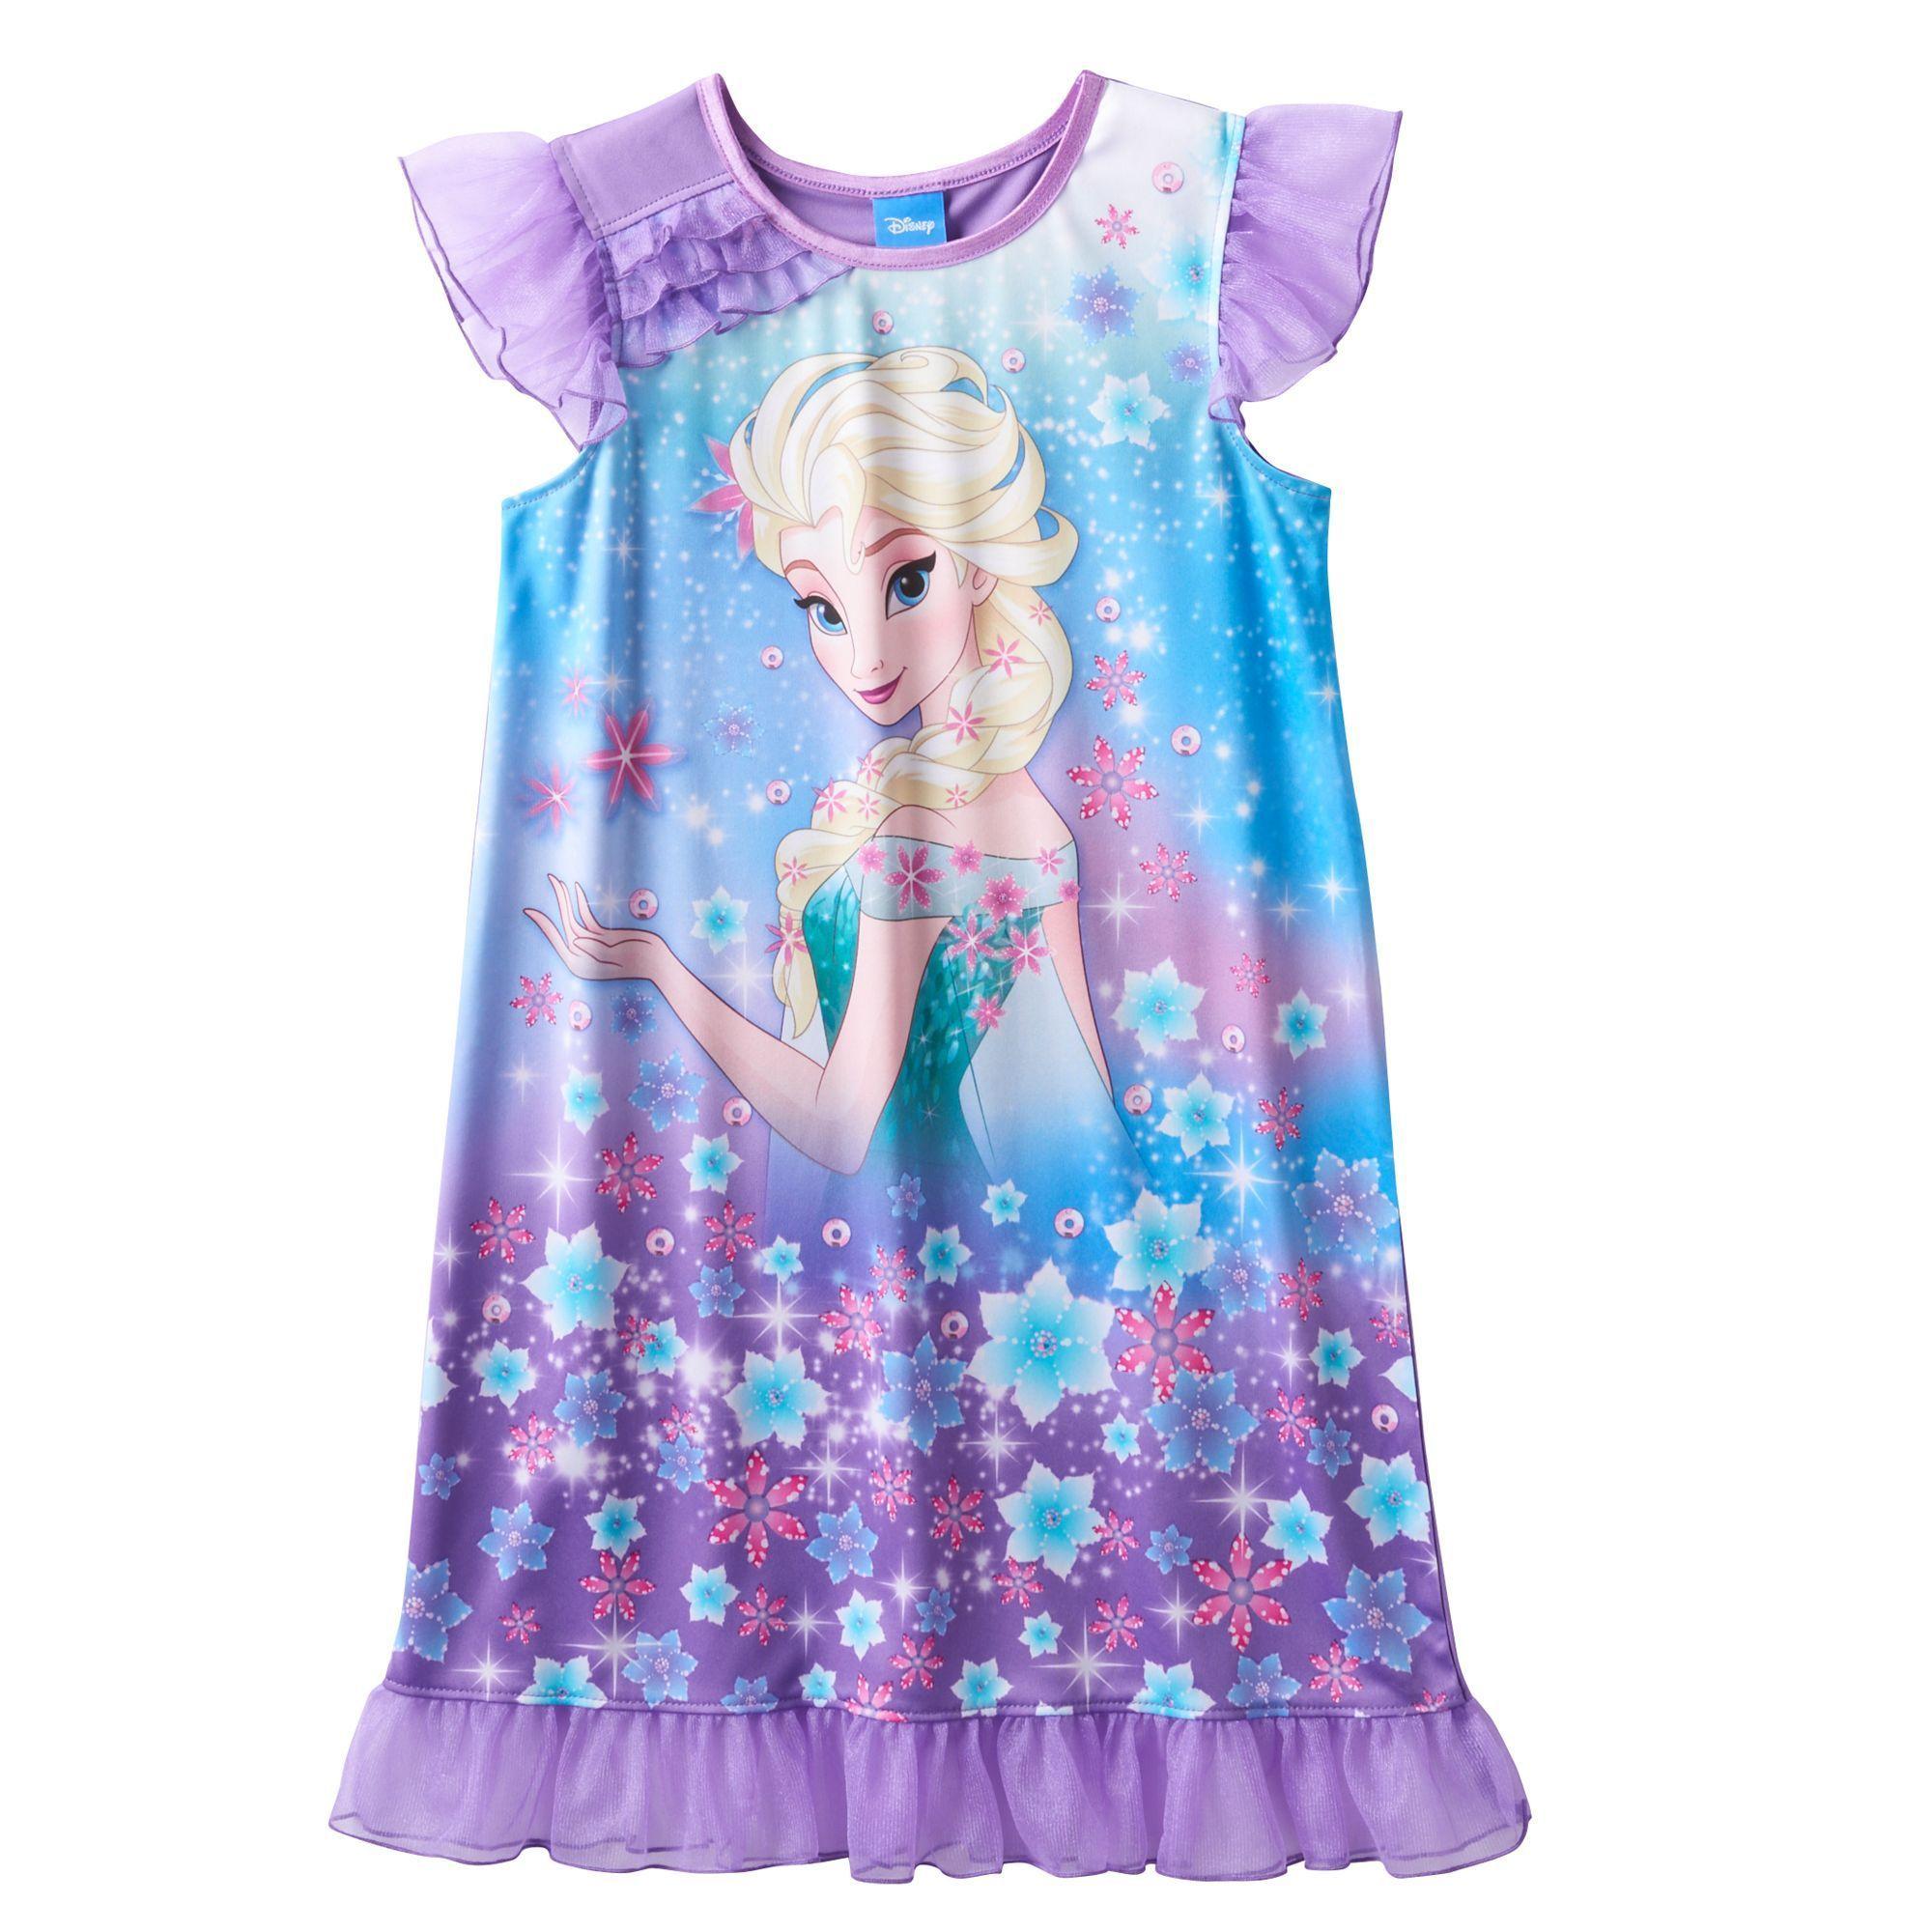 6cca2a92a1ea Disney s Frozen Elsa Girls 4-12 Cosmic Knee-Length Dorm Nightgown ...